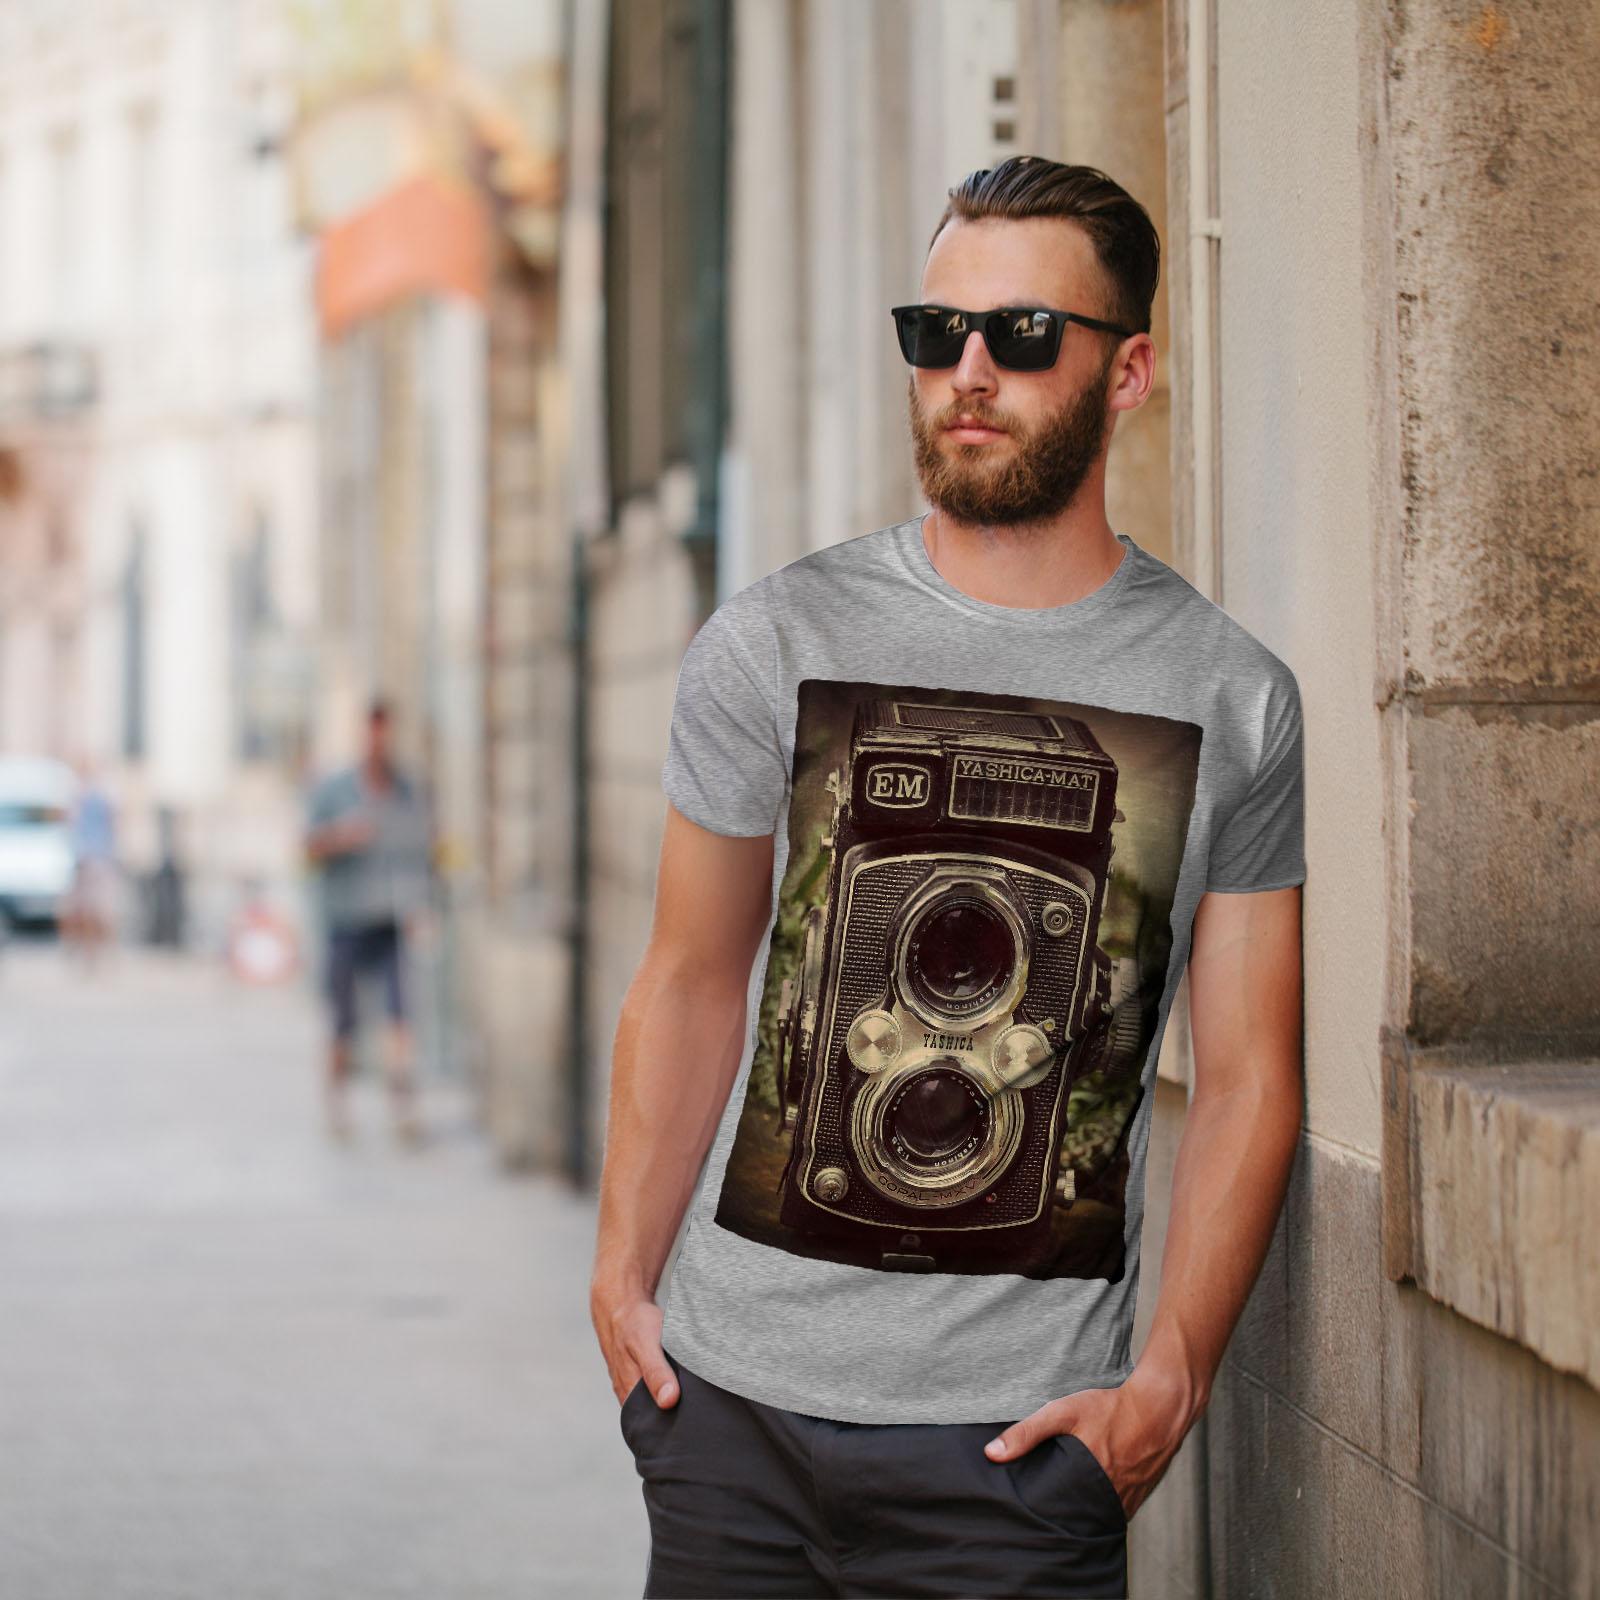 Wellcoda-Old-Foto-Camera-Mens-T-shirt-Retro-Graphic-Design-Printed-Tee thumbnail 17